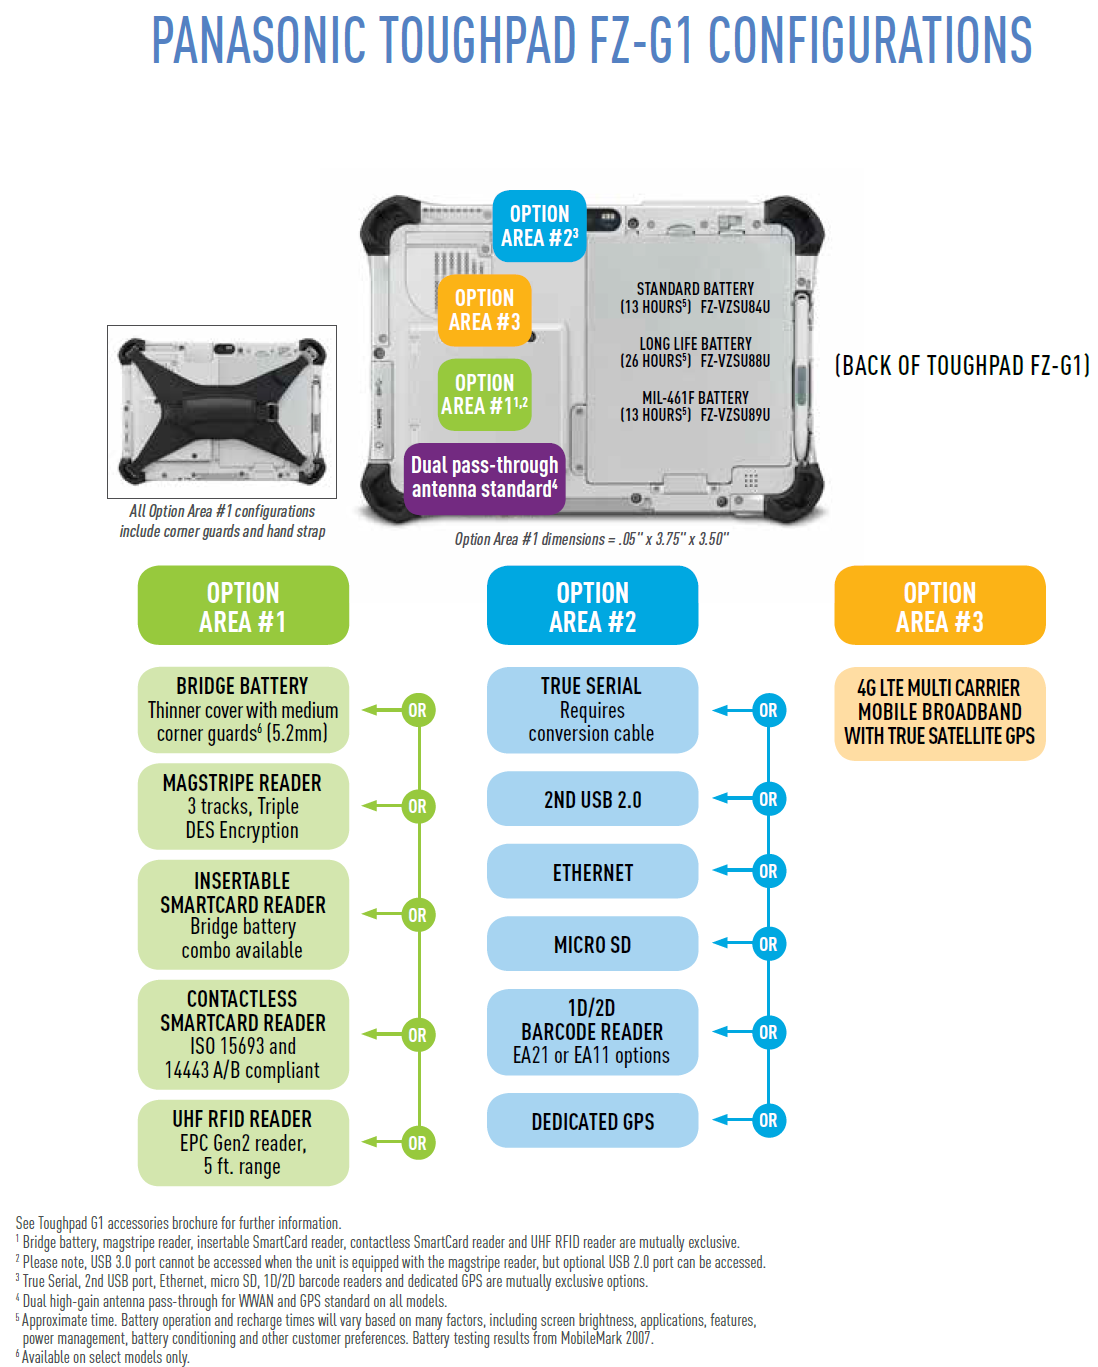 Panasonic Toughpad FZ G1 Configurations